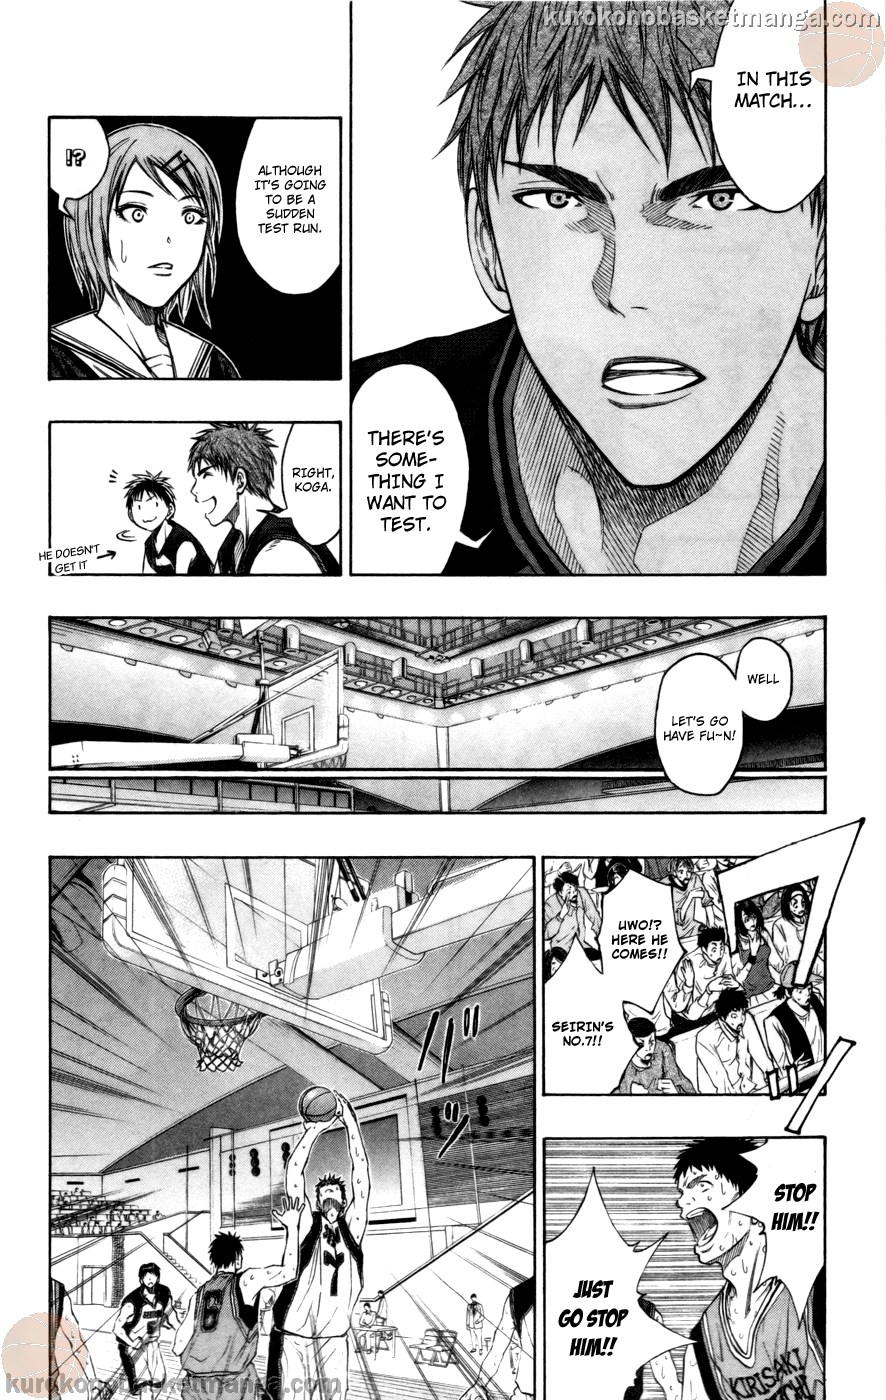 Kuroko no Basket Manga Chapter 98 - Image 13